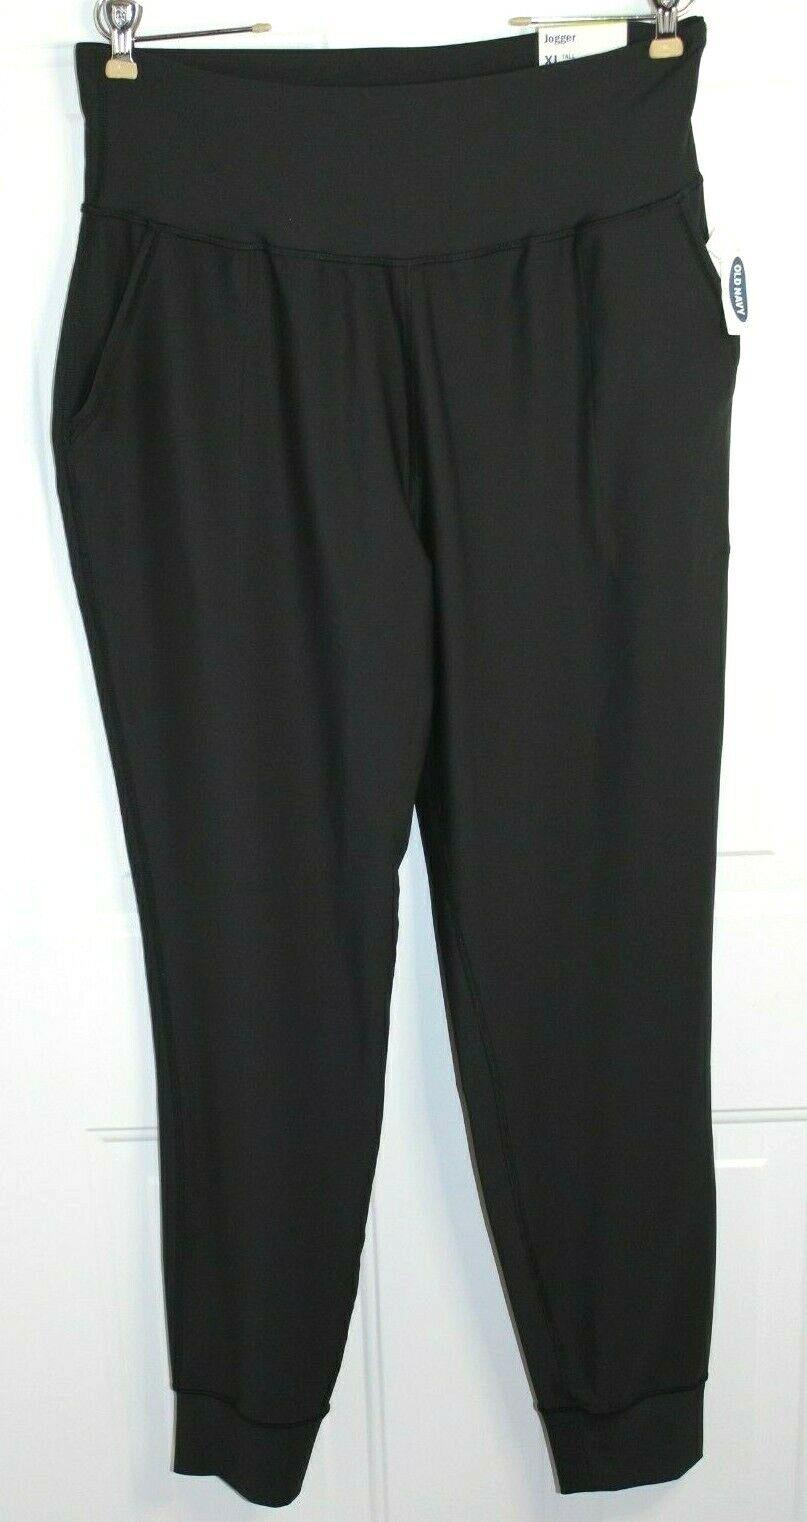 Old Navy Powersoft Black High Waisted Crop Jogger Leggings Women's XL TALL NEW